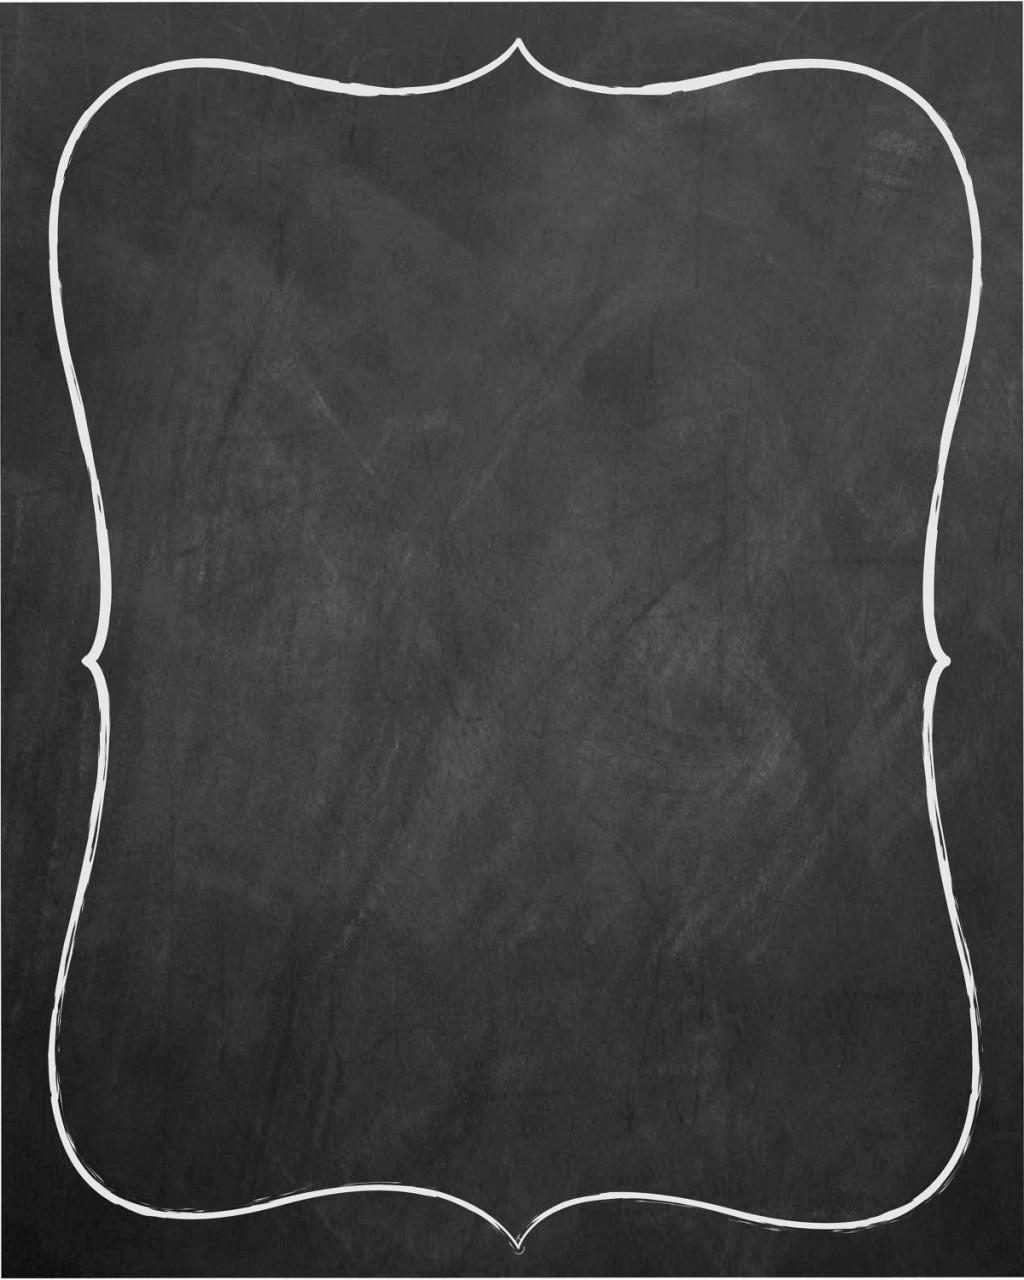 007 Unforgettable Chalkboard Invitation Template Free Idea  Download Wedding EditableLarge